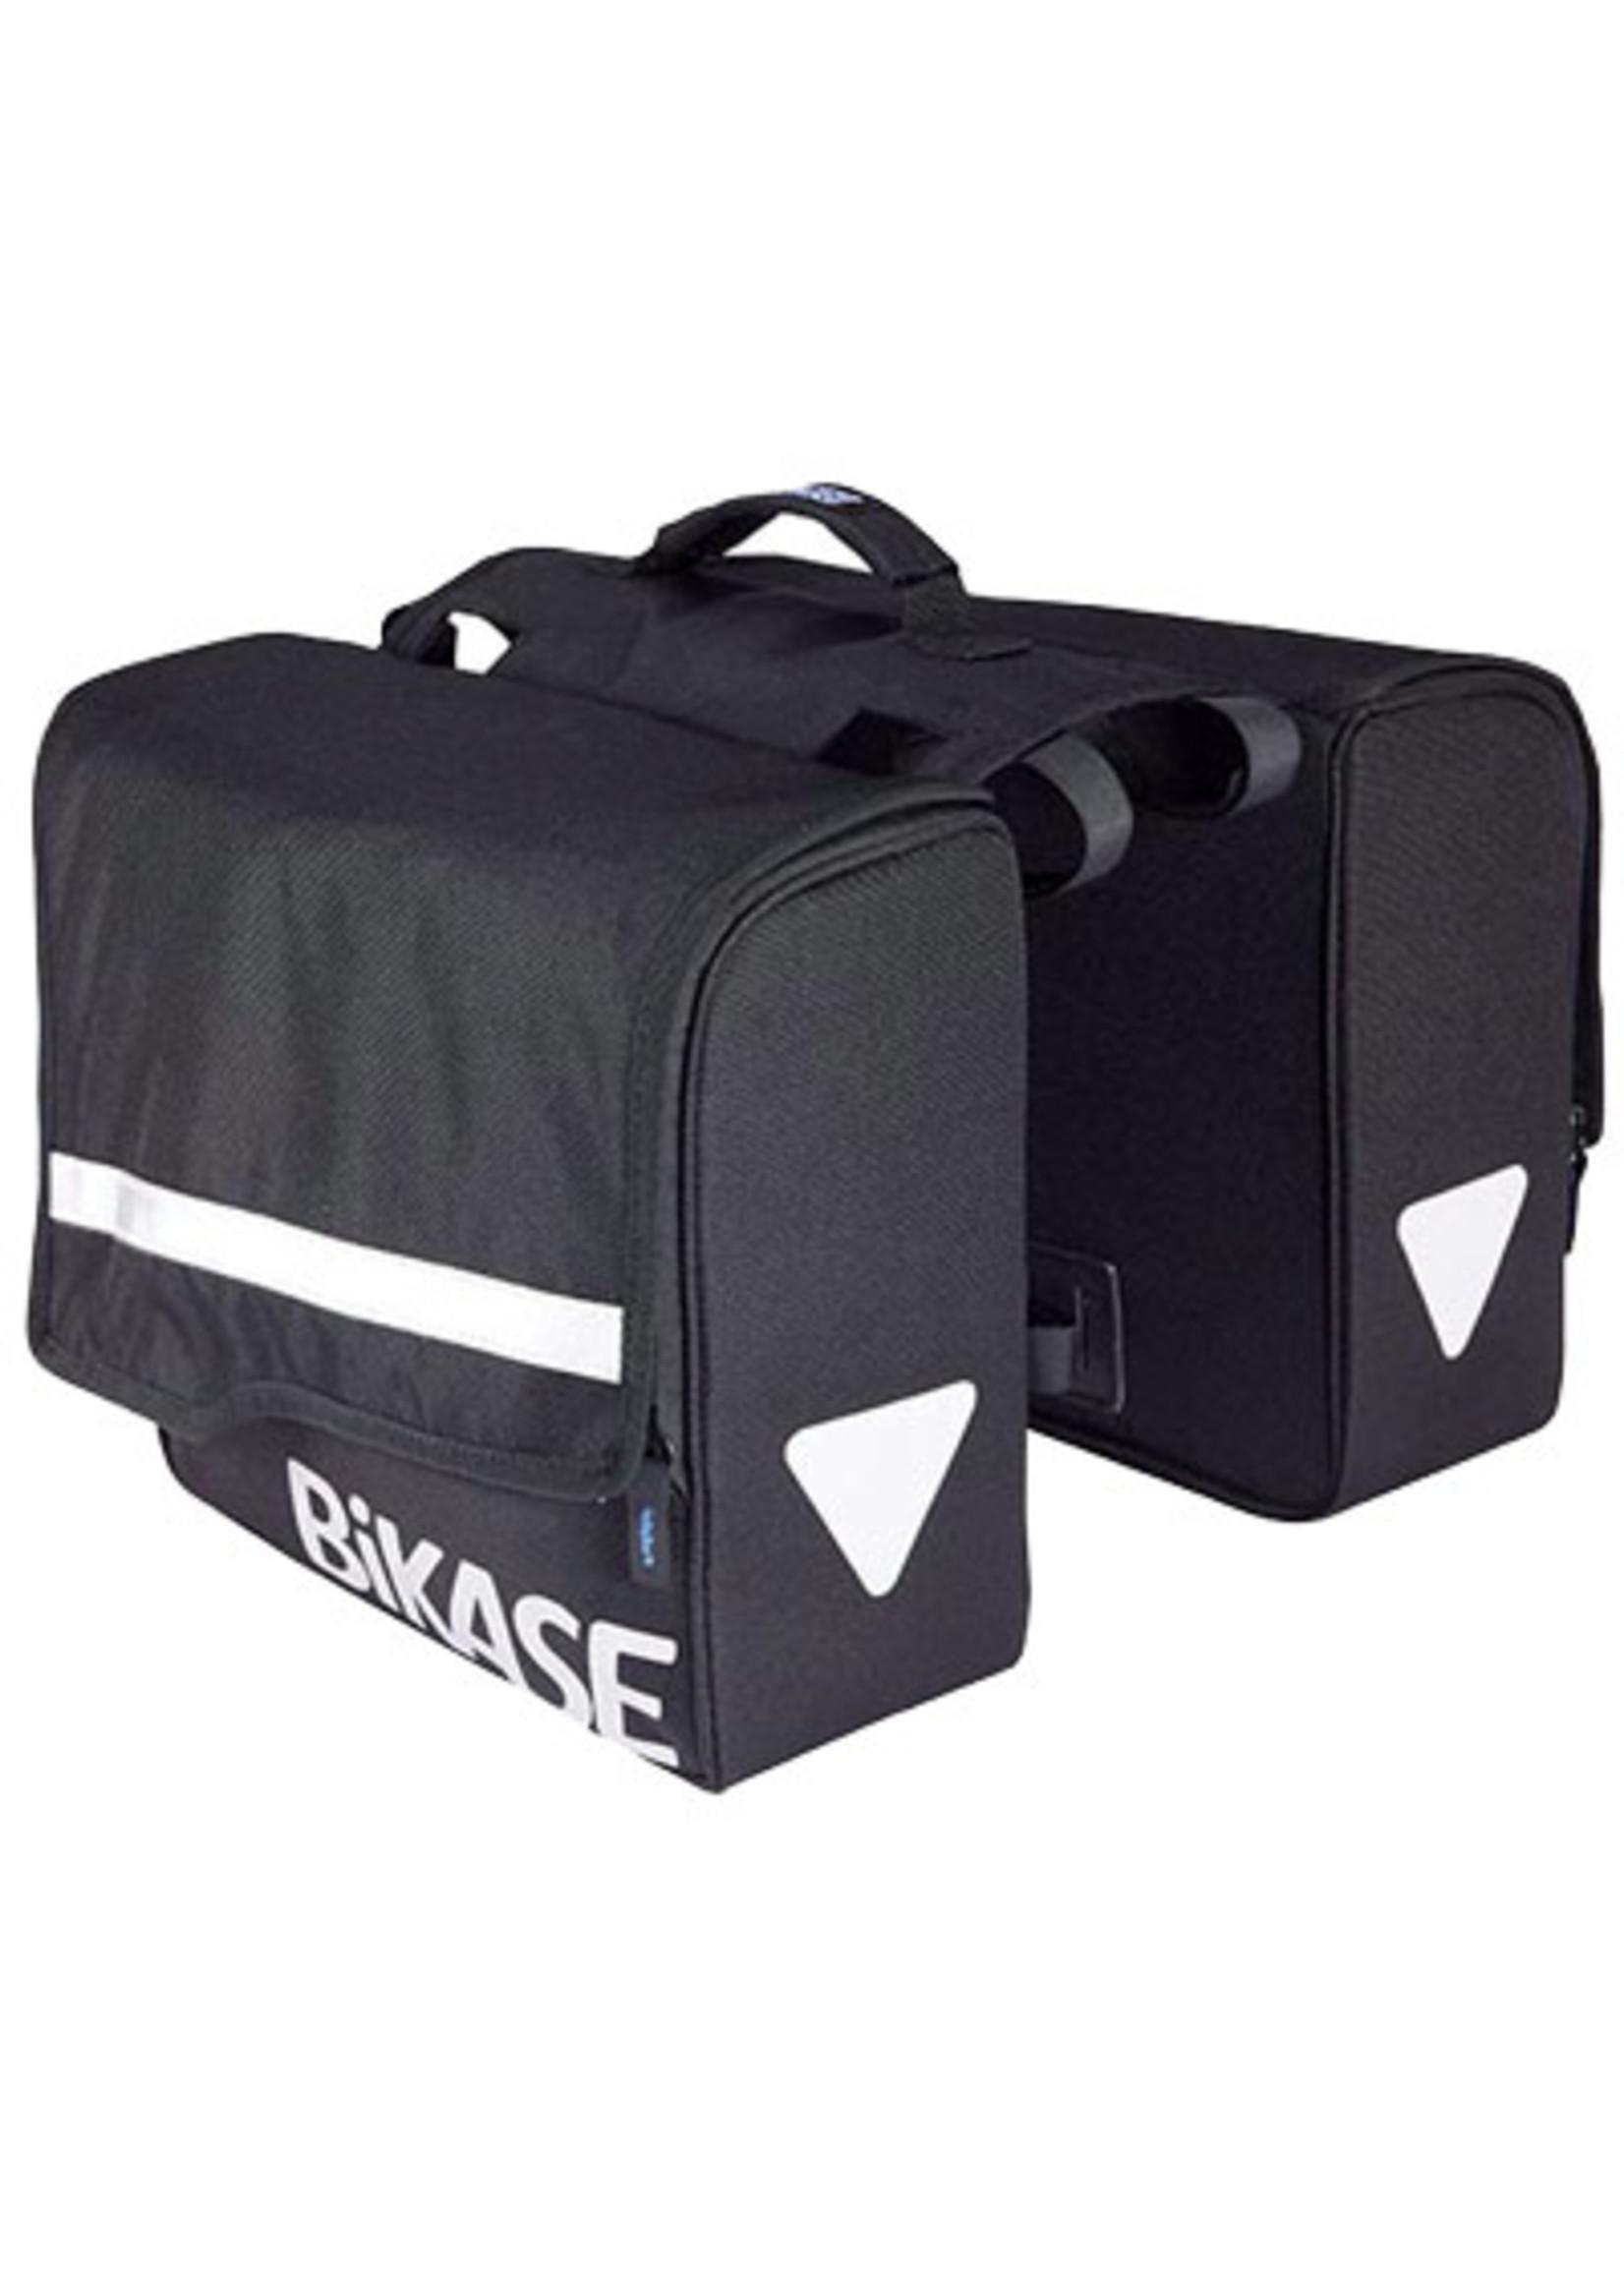 BiKASE,CITY PAINNER REAR BAG